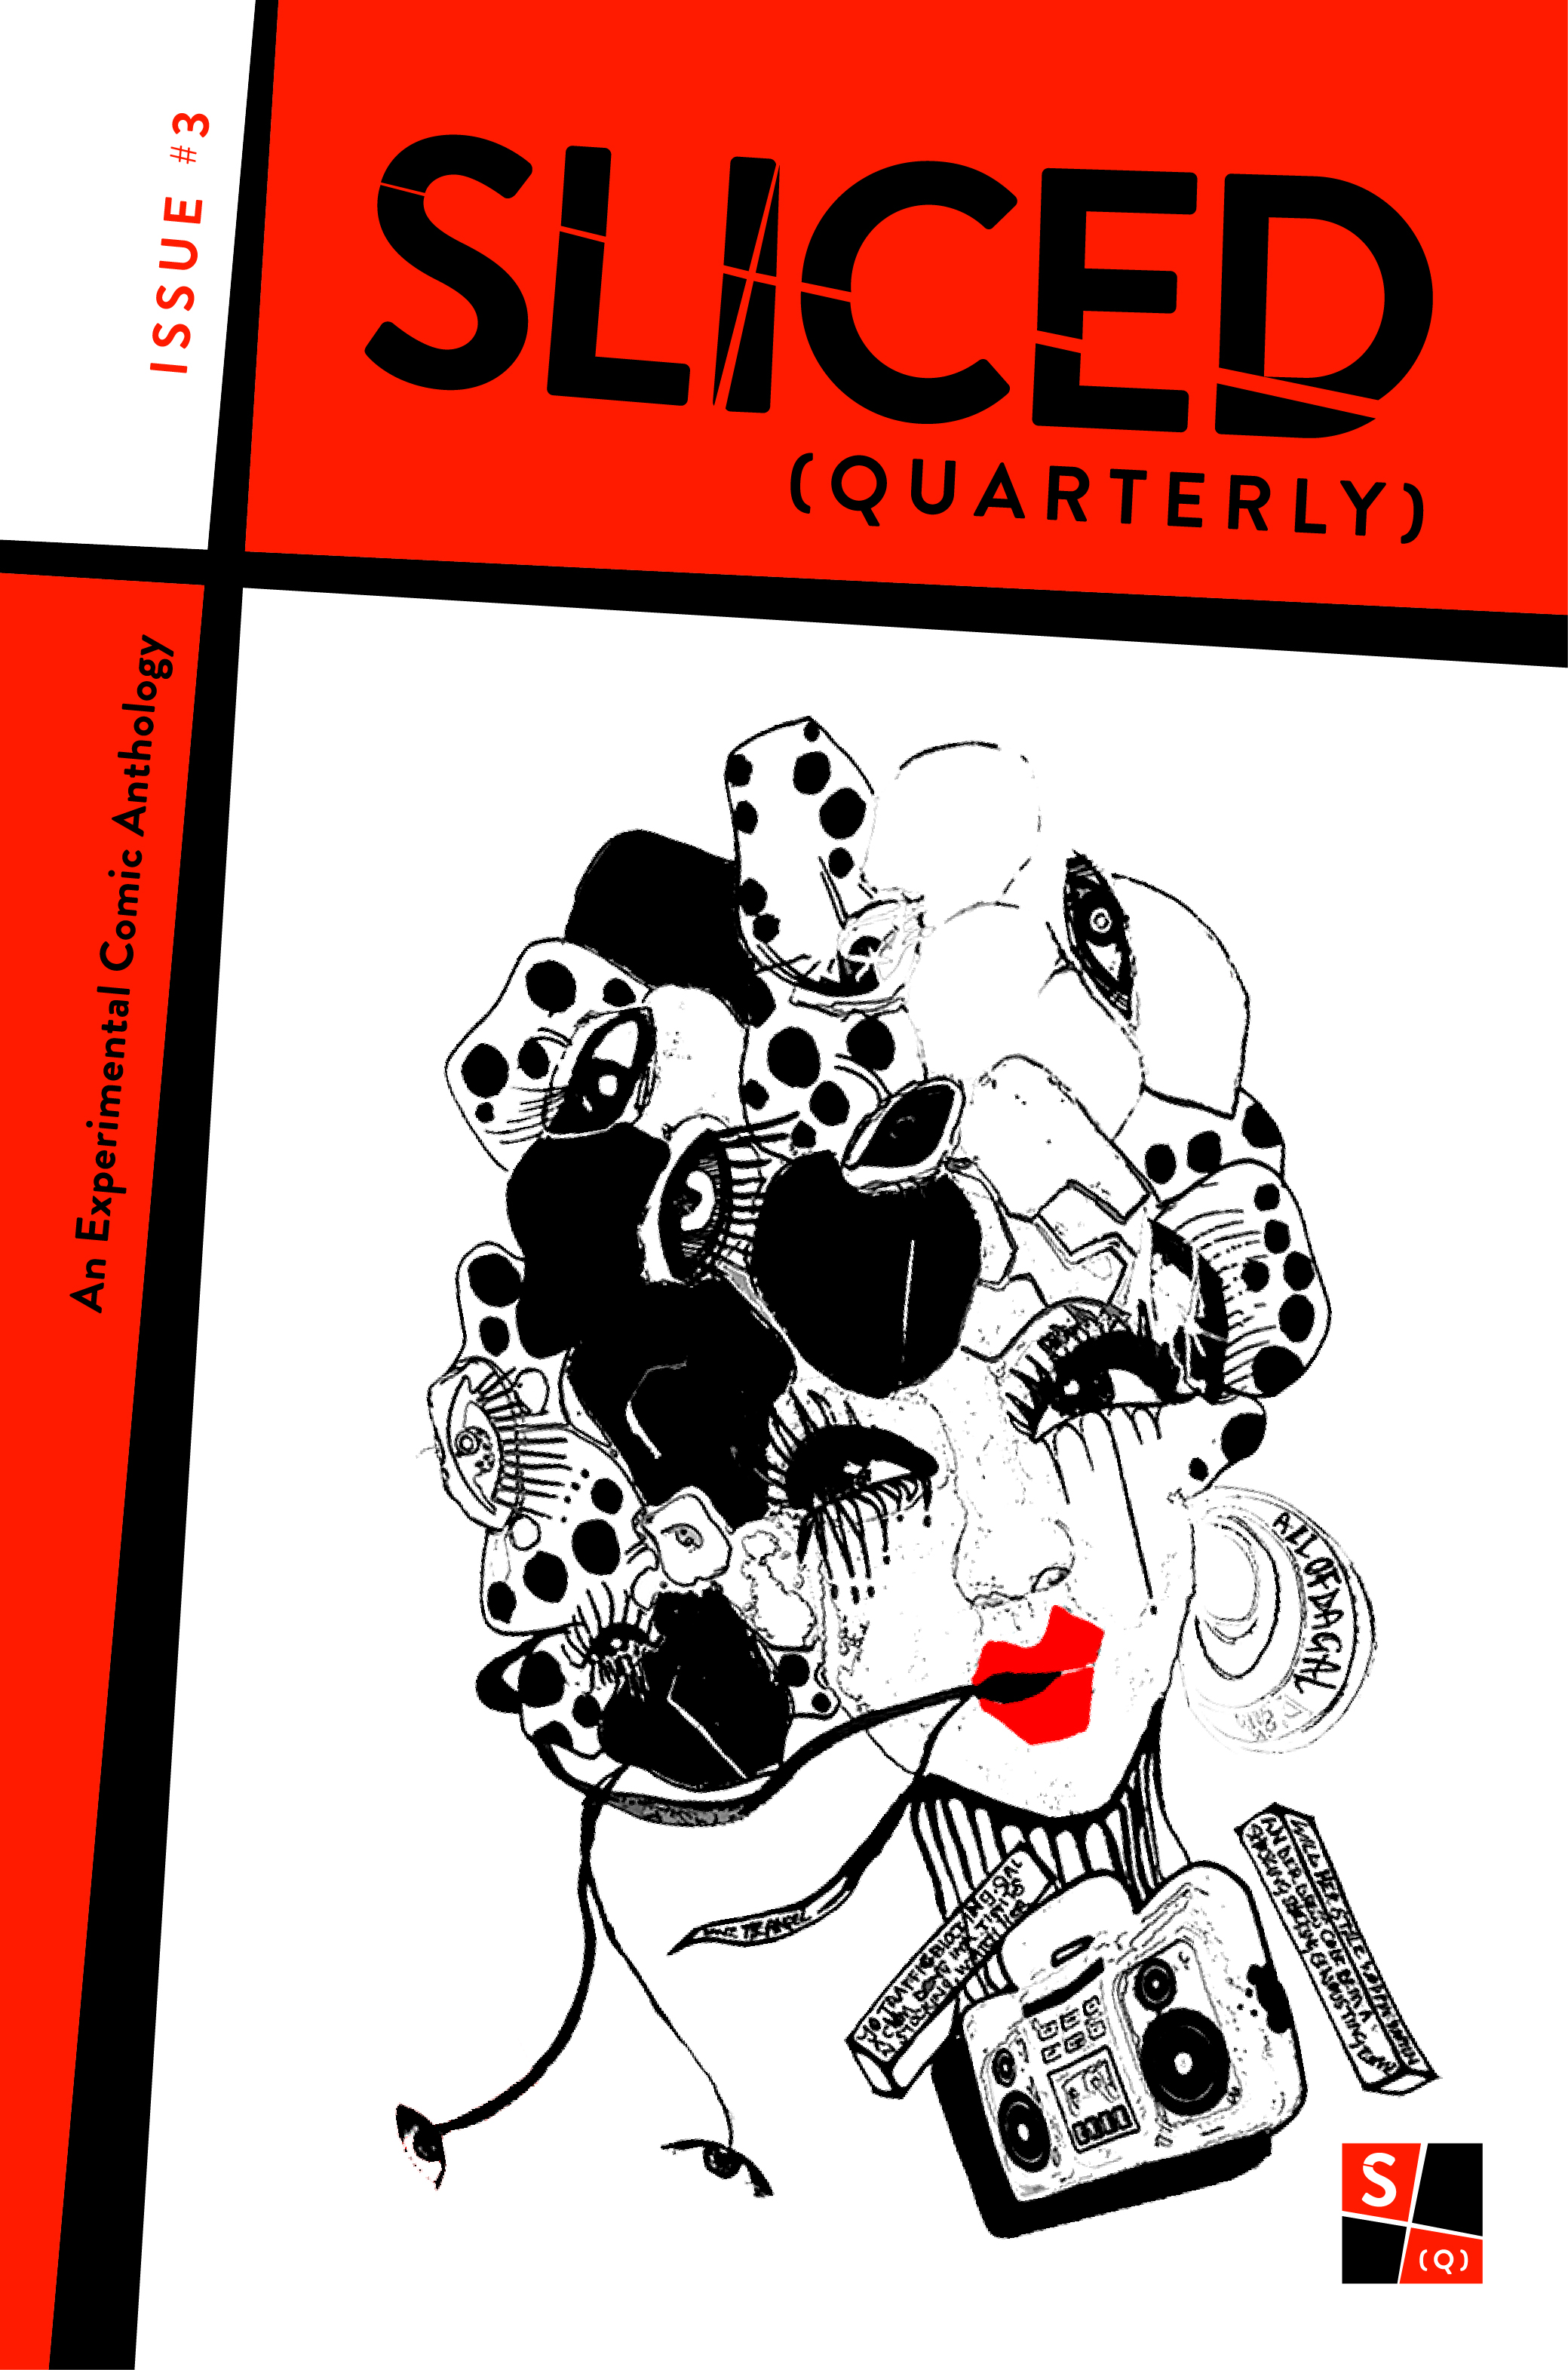 Sliced (Quarterly) Issue #3 - Cover